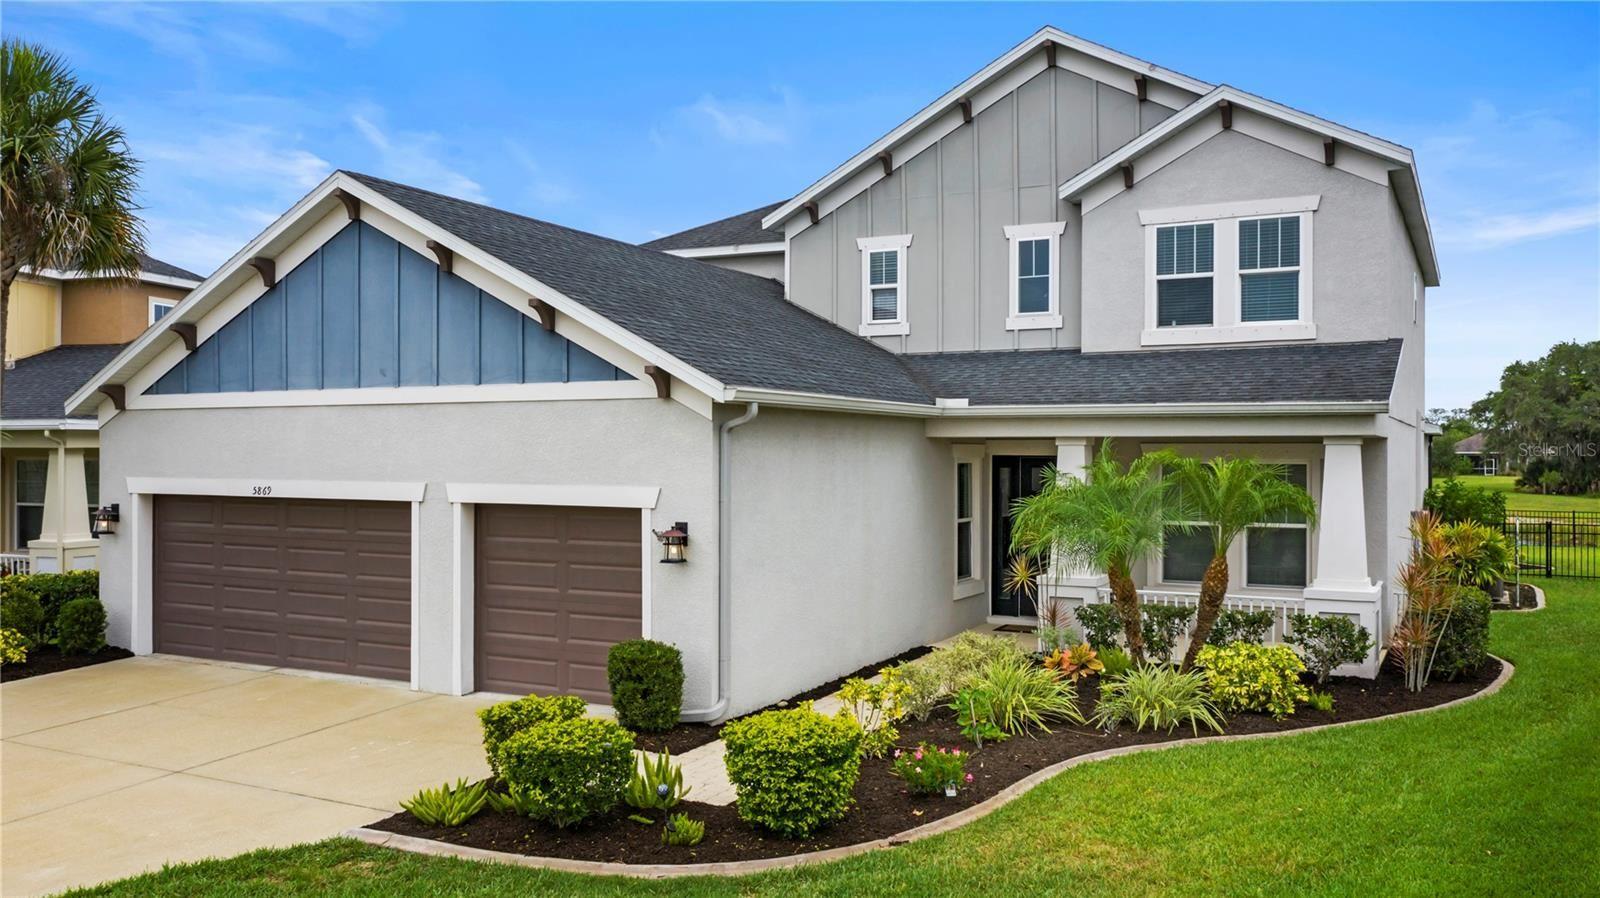 5869 PALMER RANCH PARKWAY, Sarasota, FL 34238 - #: A4504371